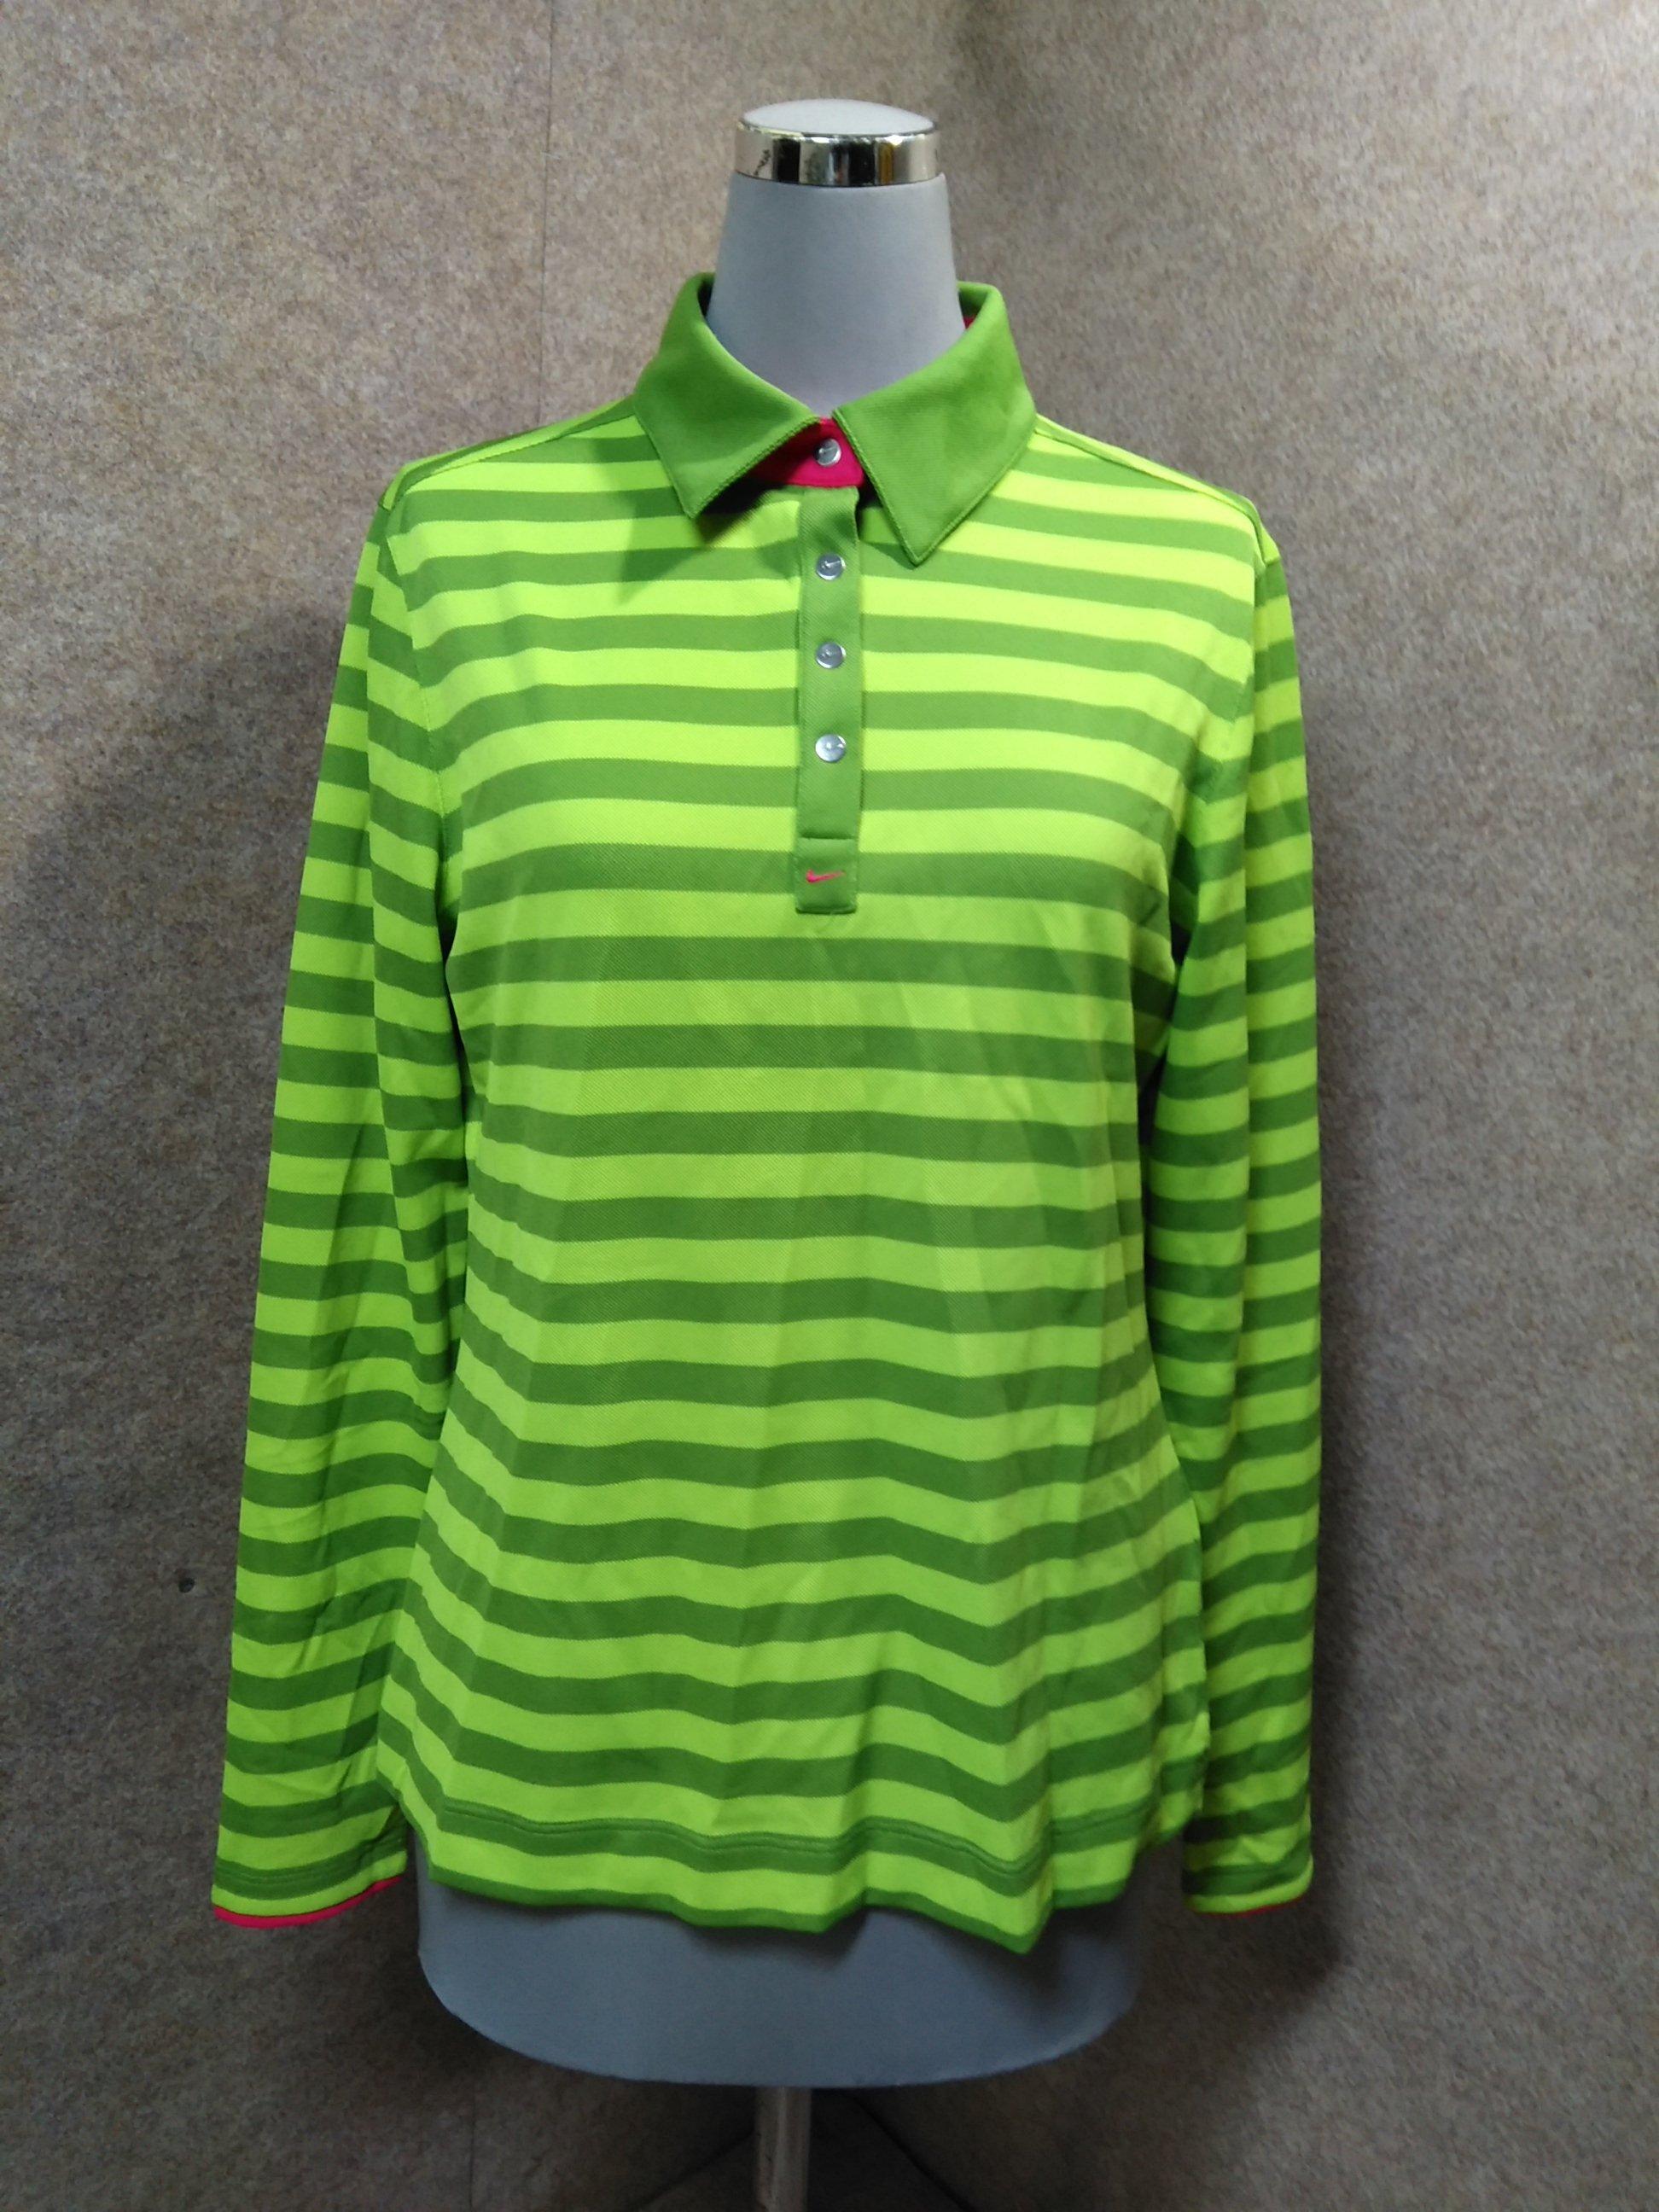 NIKE ナイキ ゴルフ ポロシャツ 長袖 L 緑 ボーダー mu361s